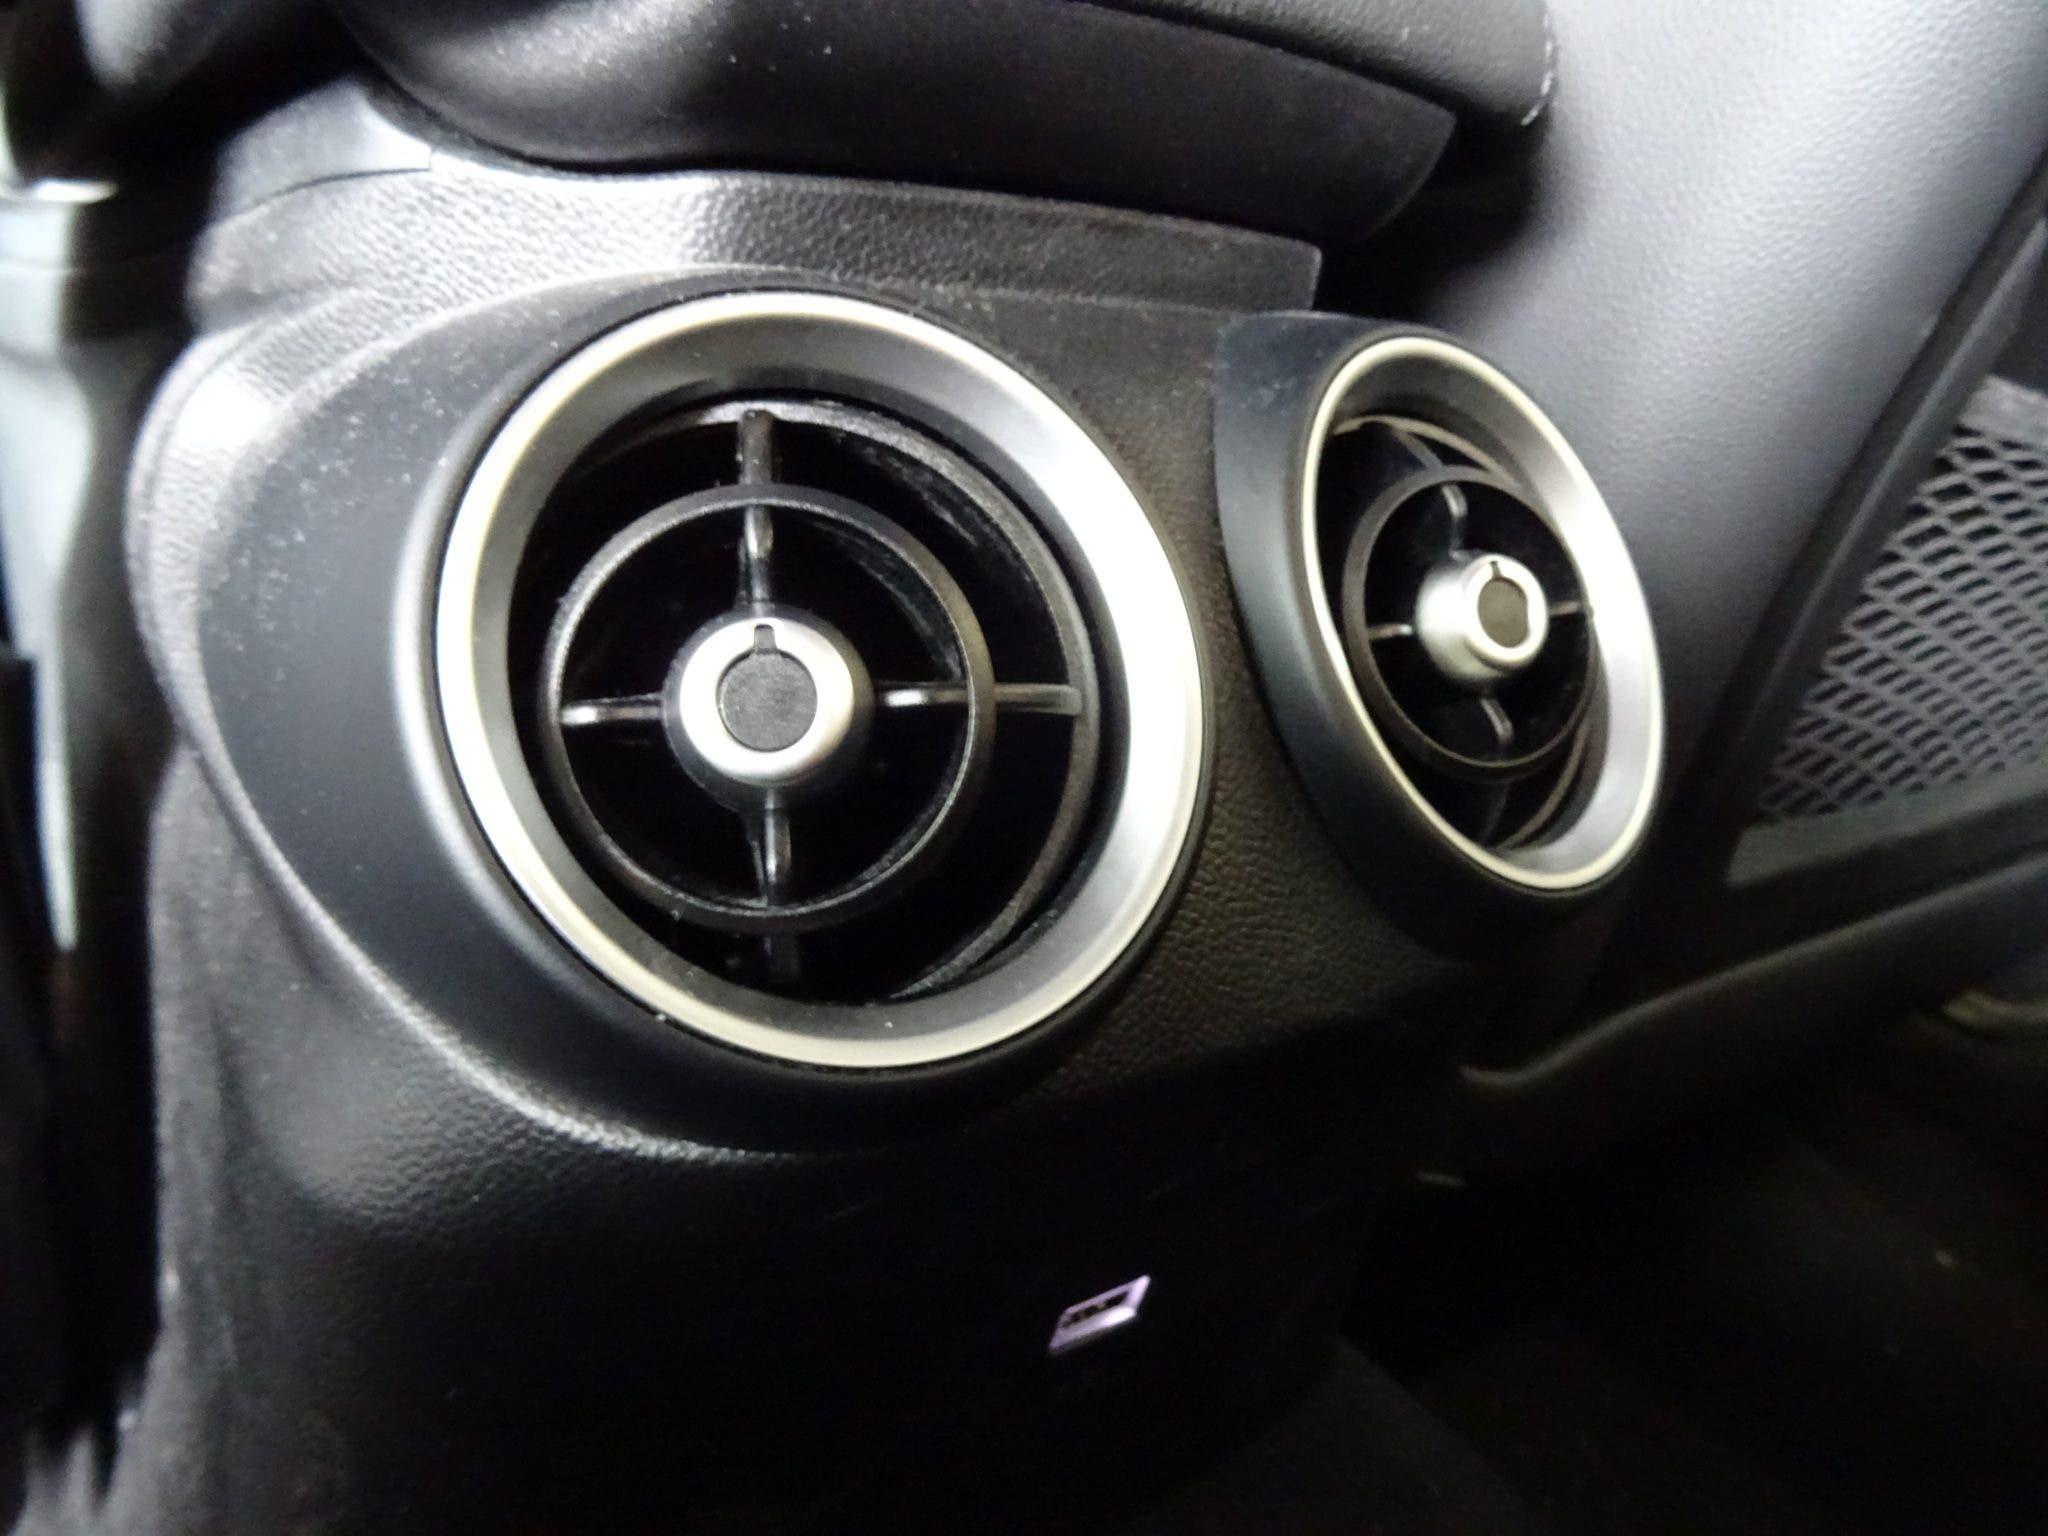 Club Alfa Romeo Giulia interni bocchette